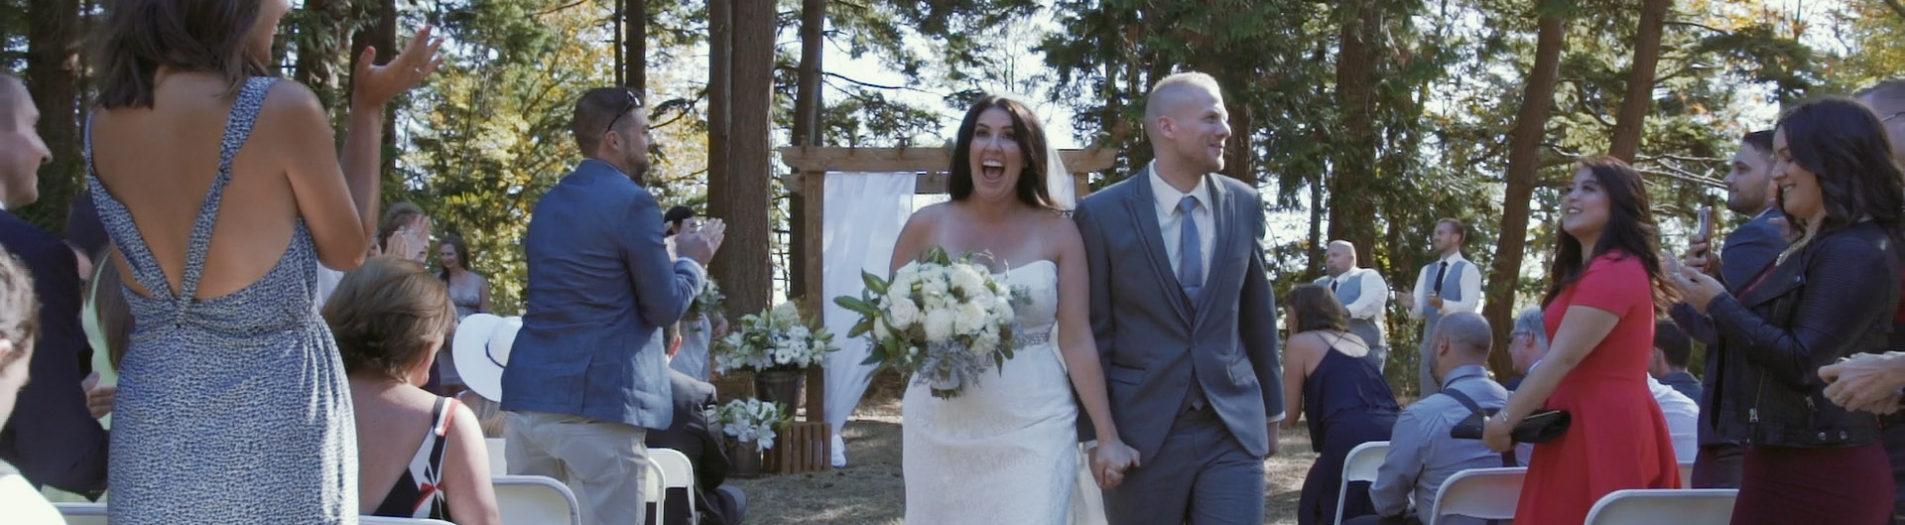 Lauren + David | Wedding Highlight Film | Kwomais Lodge Sanford Hall, Surrey BC